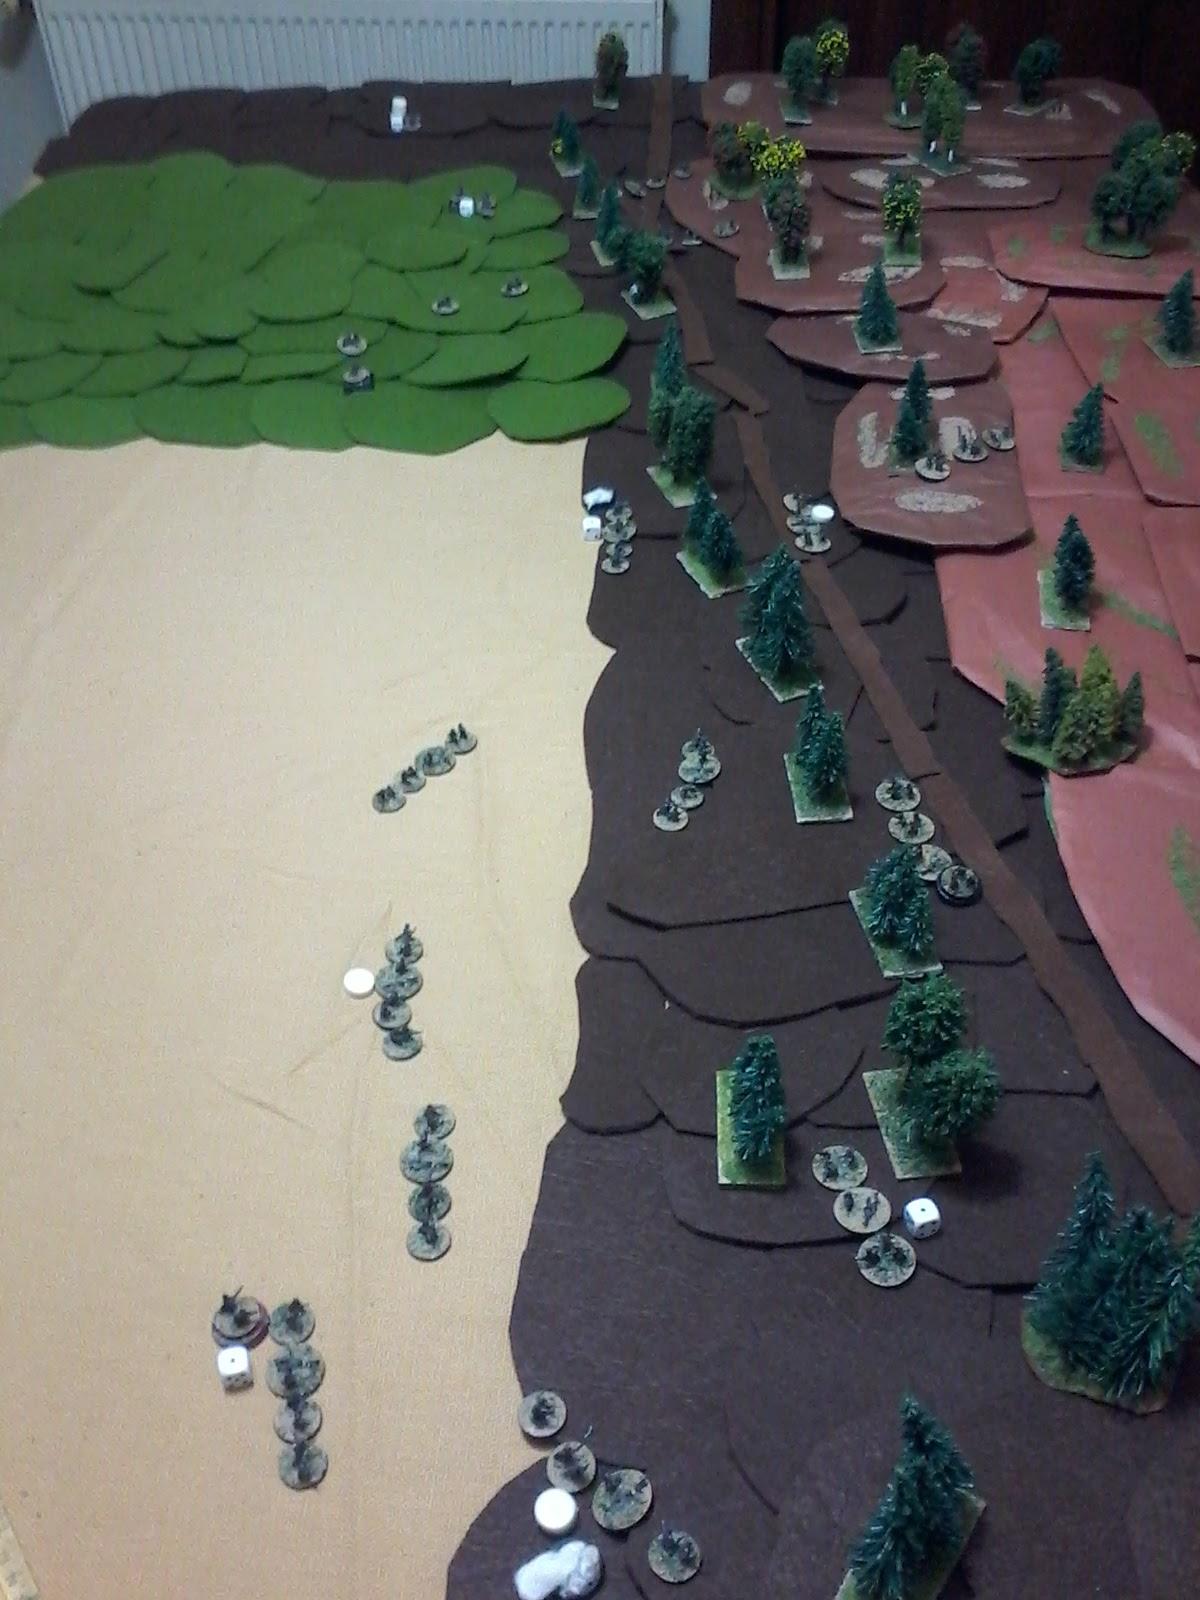 The Greek Platoon under severe pressure